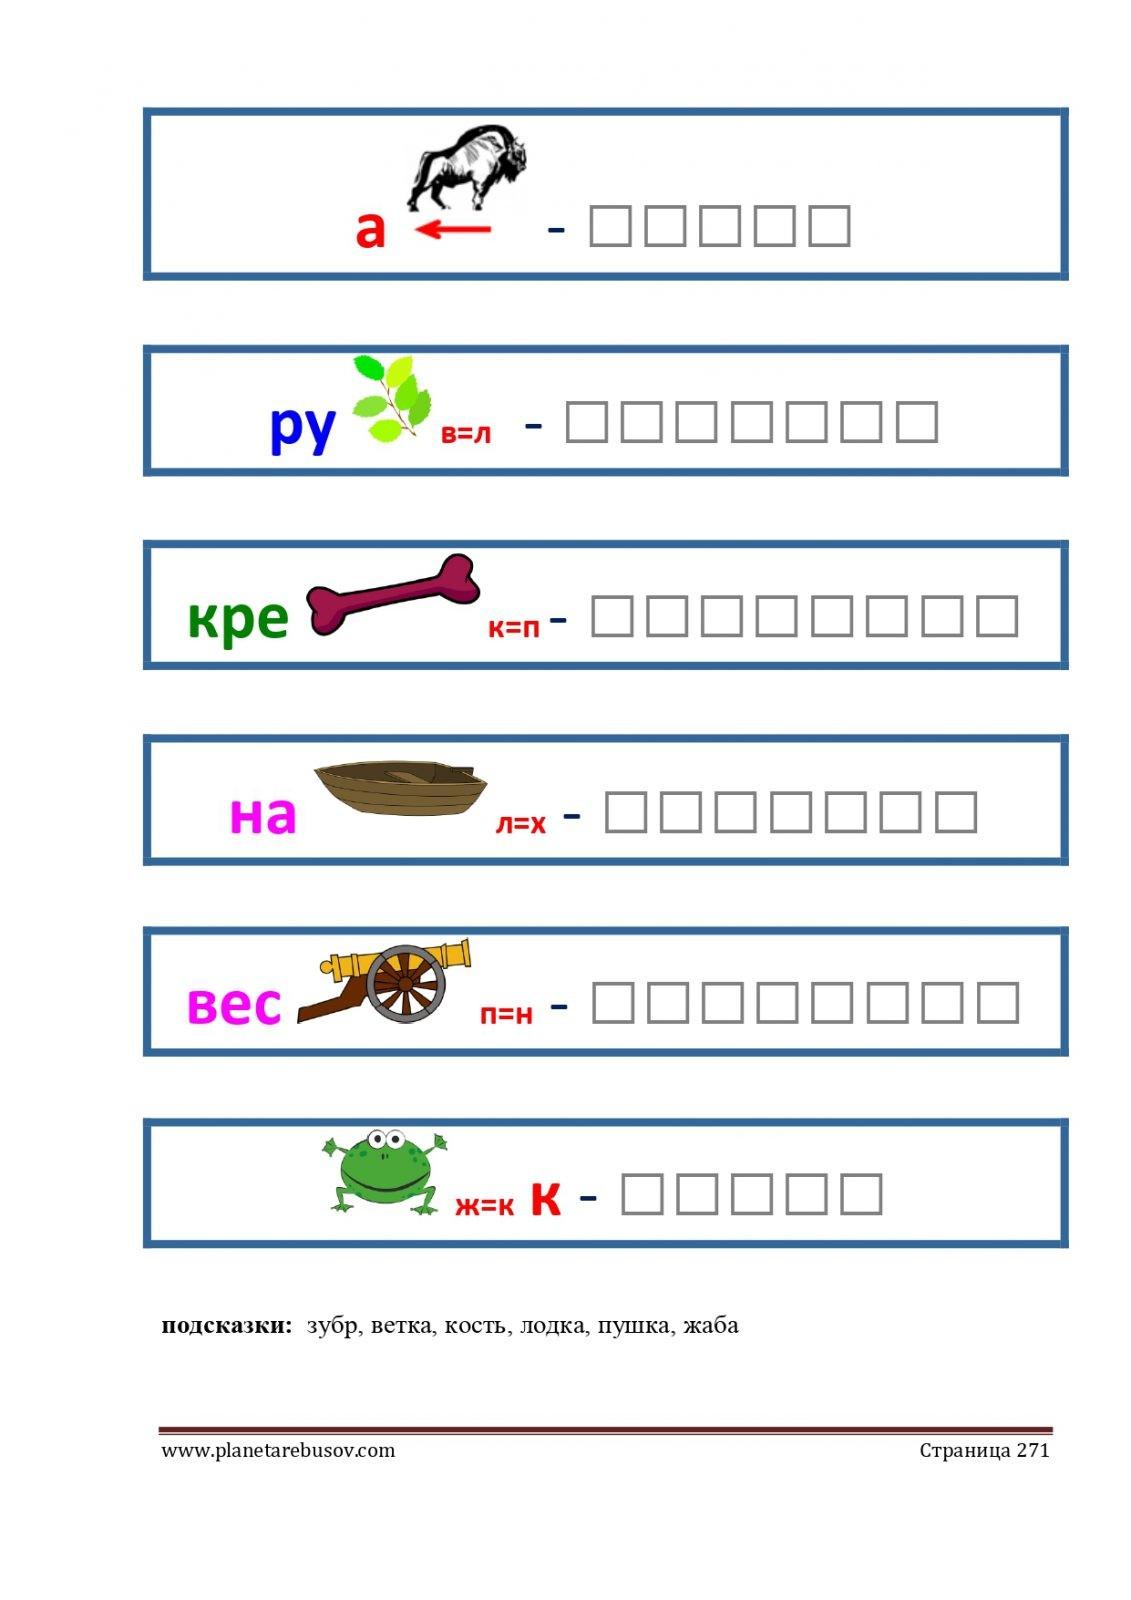 Ребусы: арбуз, рулетка, крепость, находка, веснушка, кабак